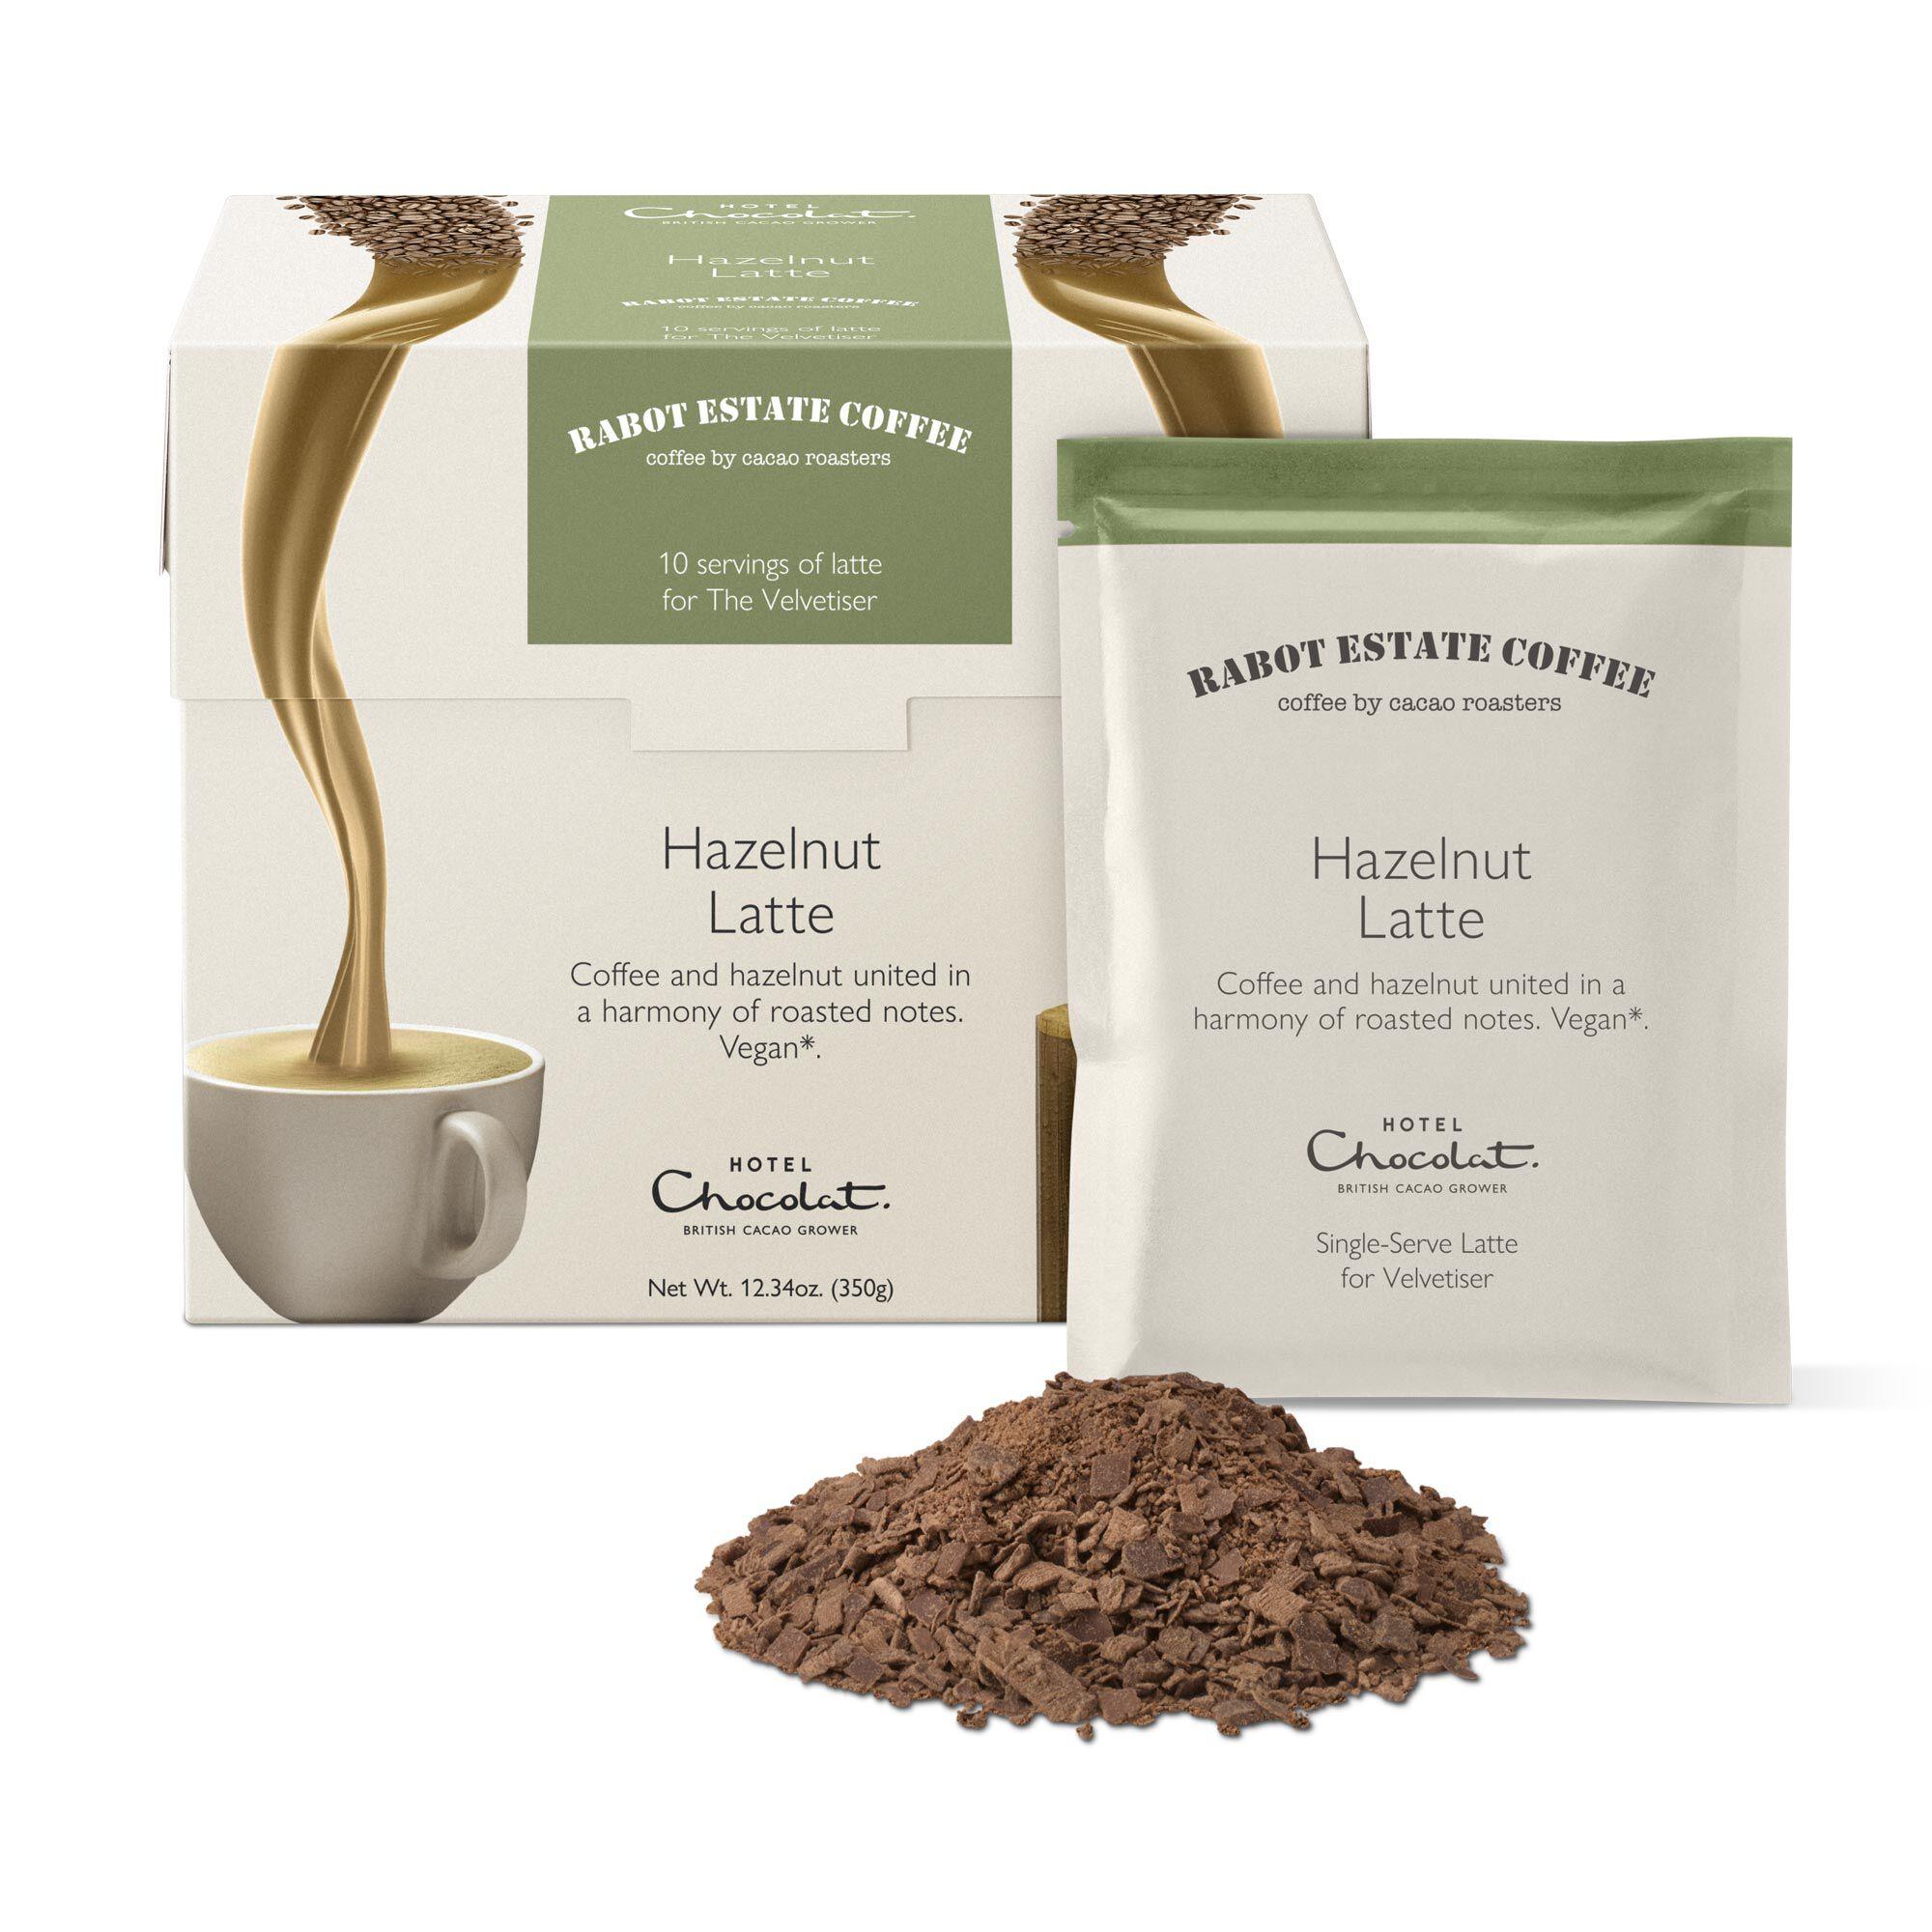 NEW Hazelnut Latte